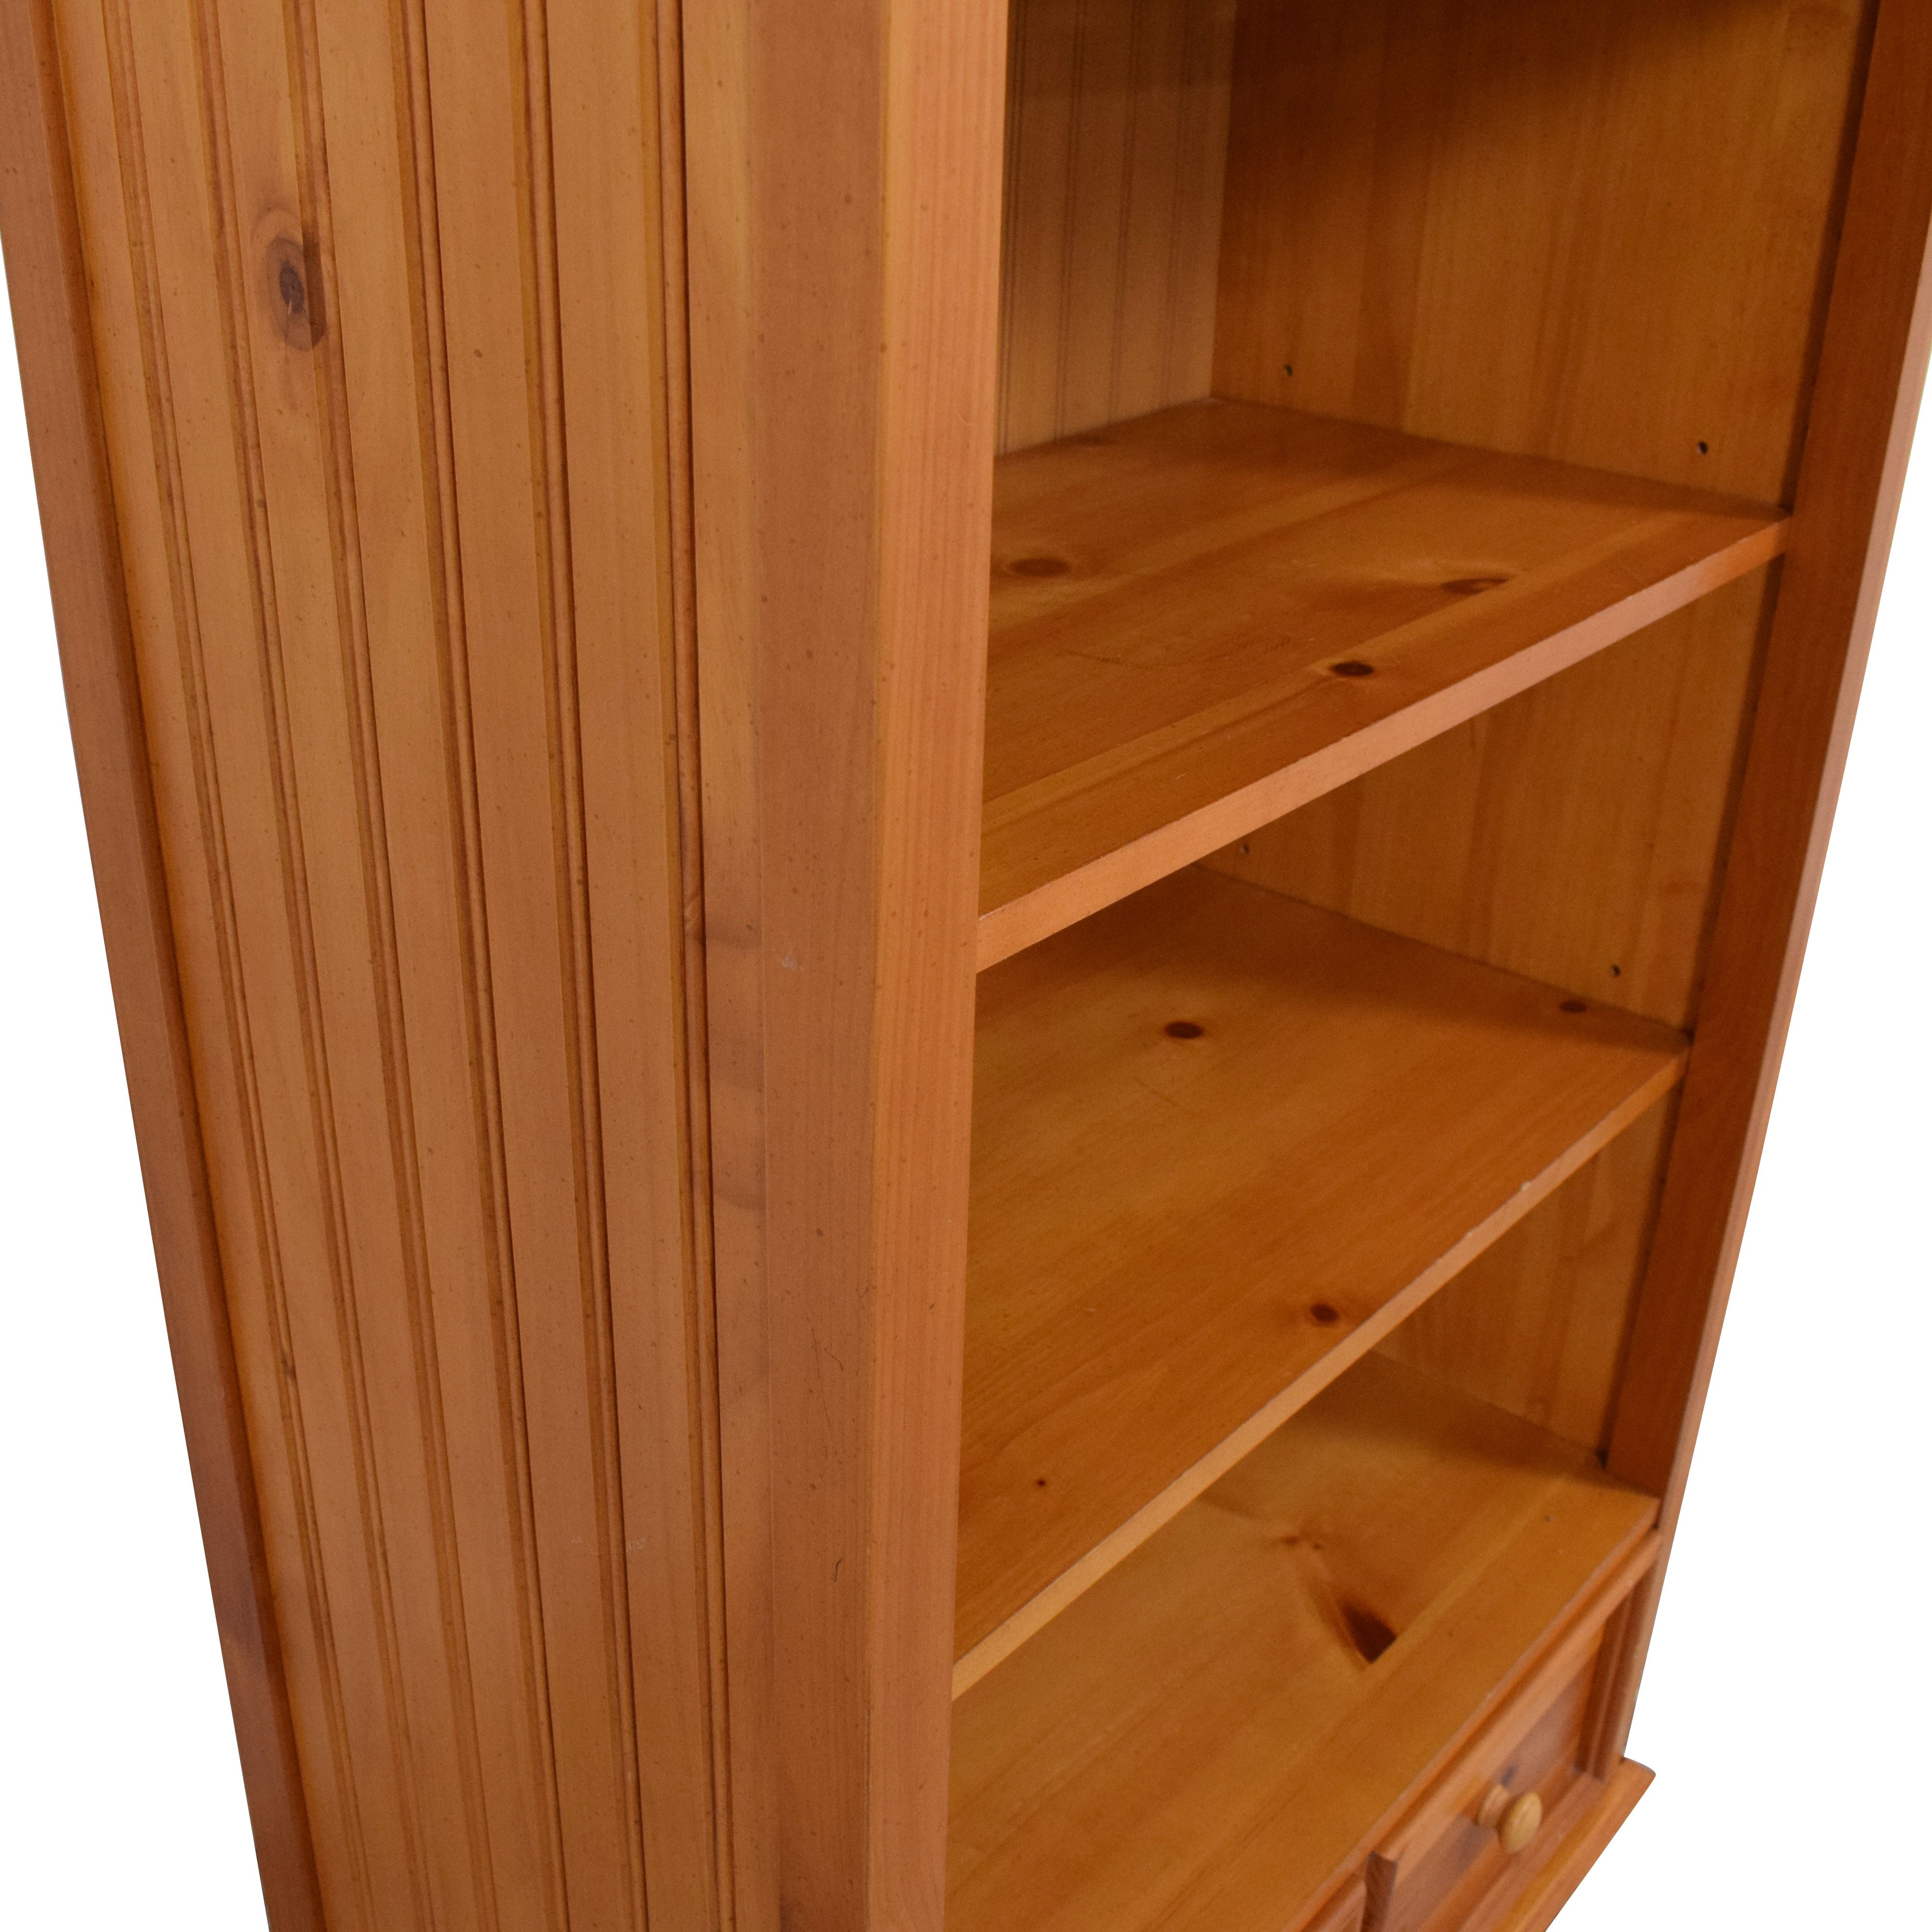 Stanley Furniture Stanley Furniture Bookcase on sale